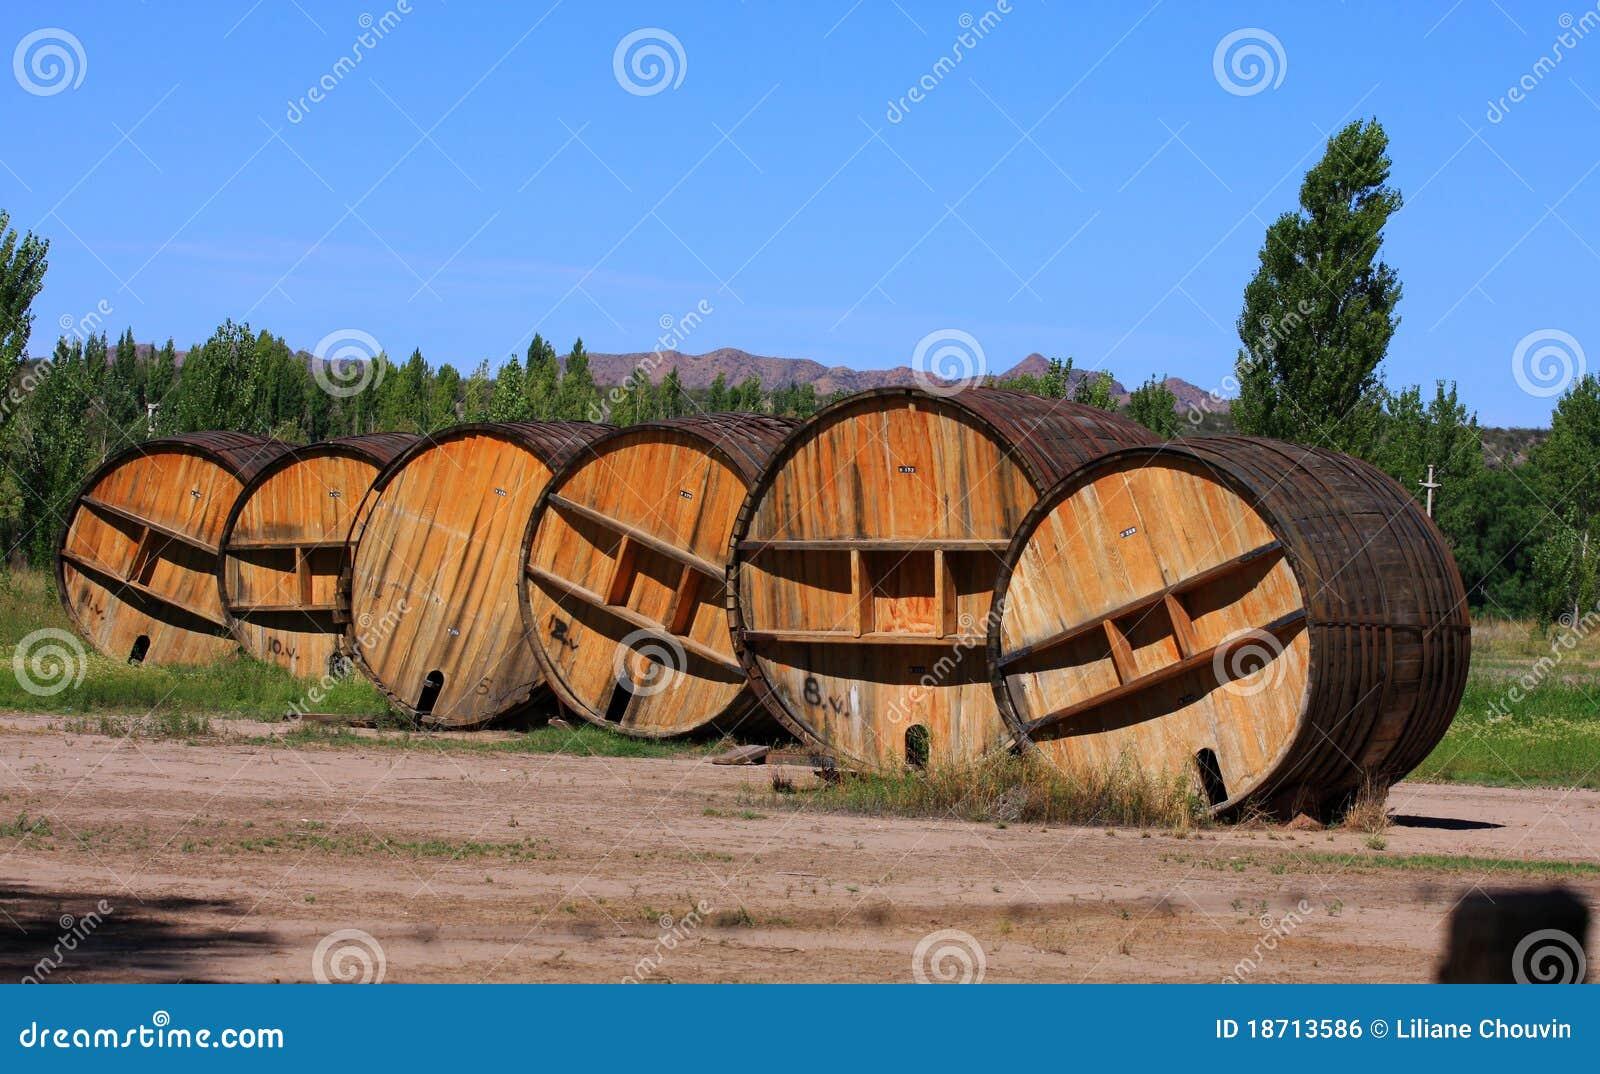 Big Red Wine Barrels Stock Photo Image Of Wine Alcohol 18713586